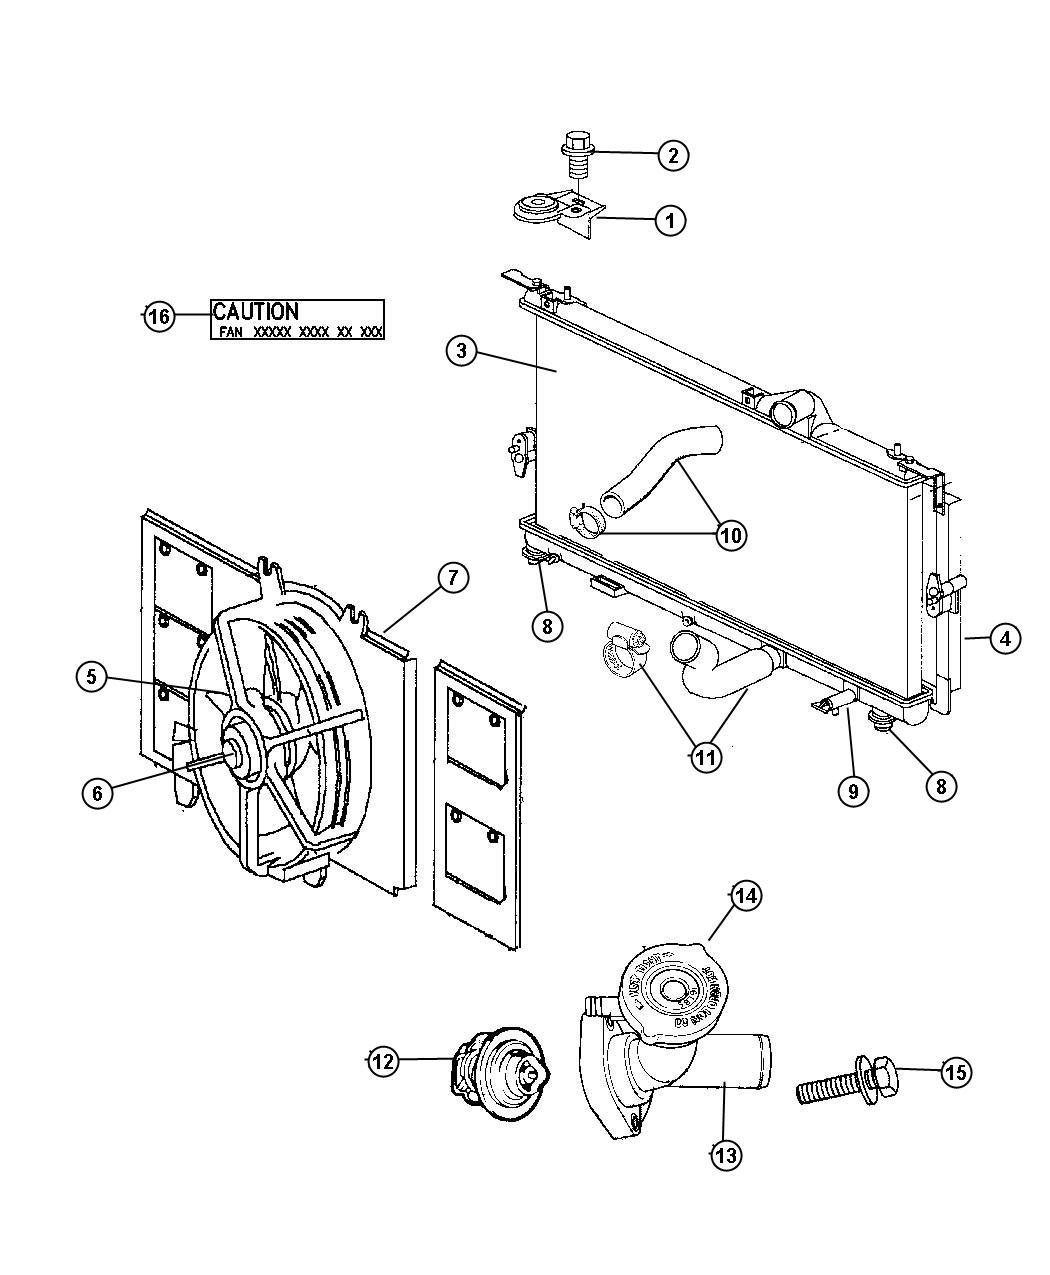 2007 Dodge Nitro Condenser  Air Conditioning  Plumbing  Related  Radiator